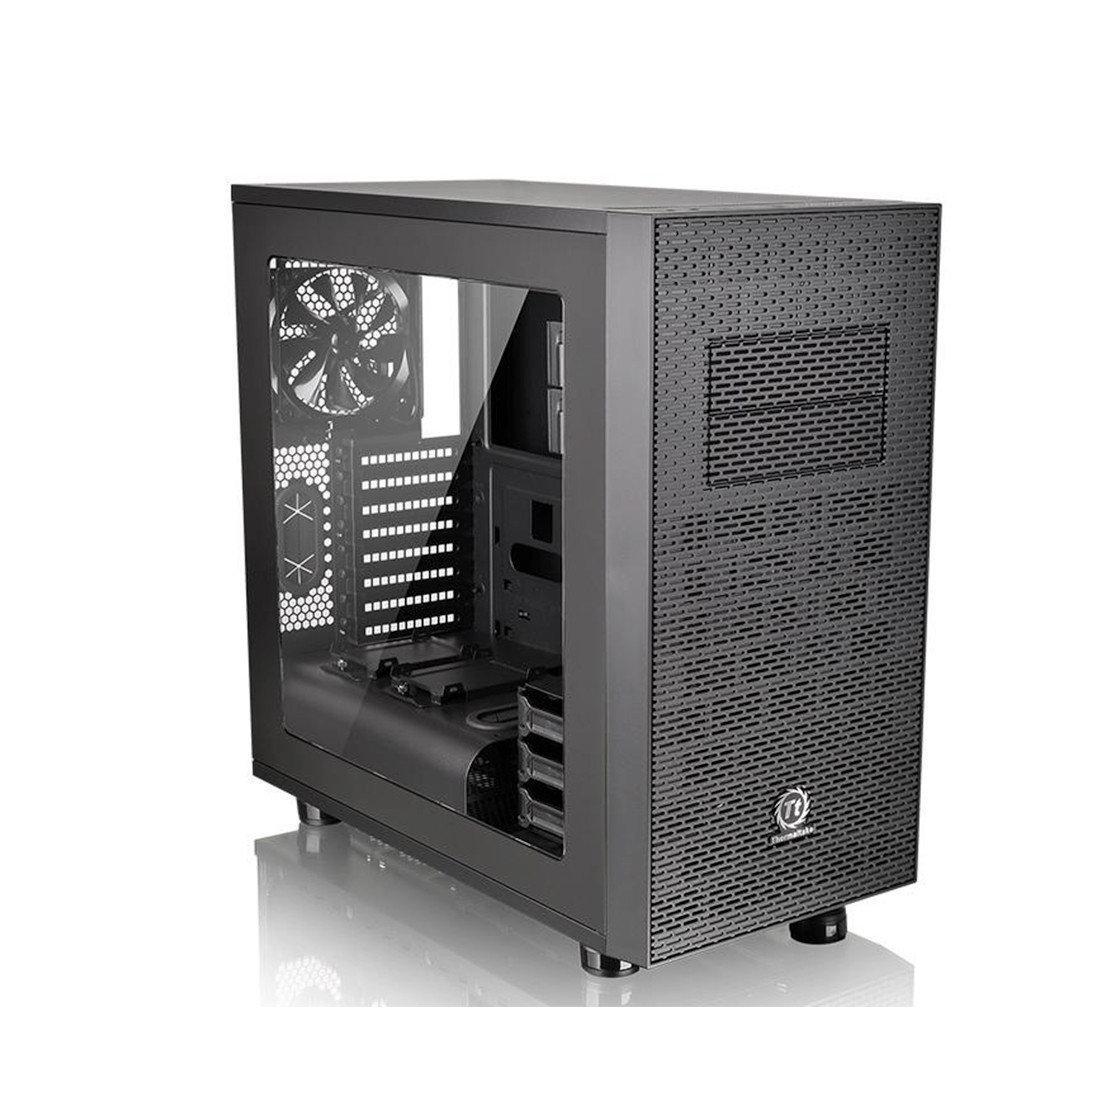 Системный блок Intel Core i5-7400 3.0GHZ/H110/DDR4 8GB/HDD 1TB/DVD/450W